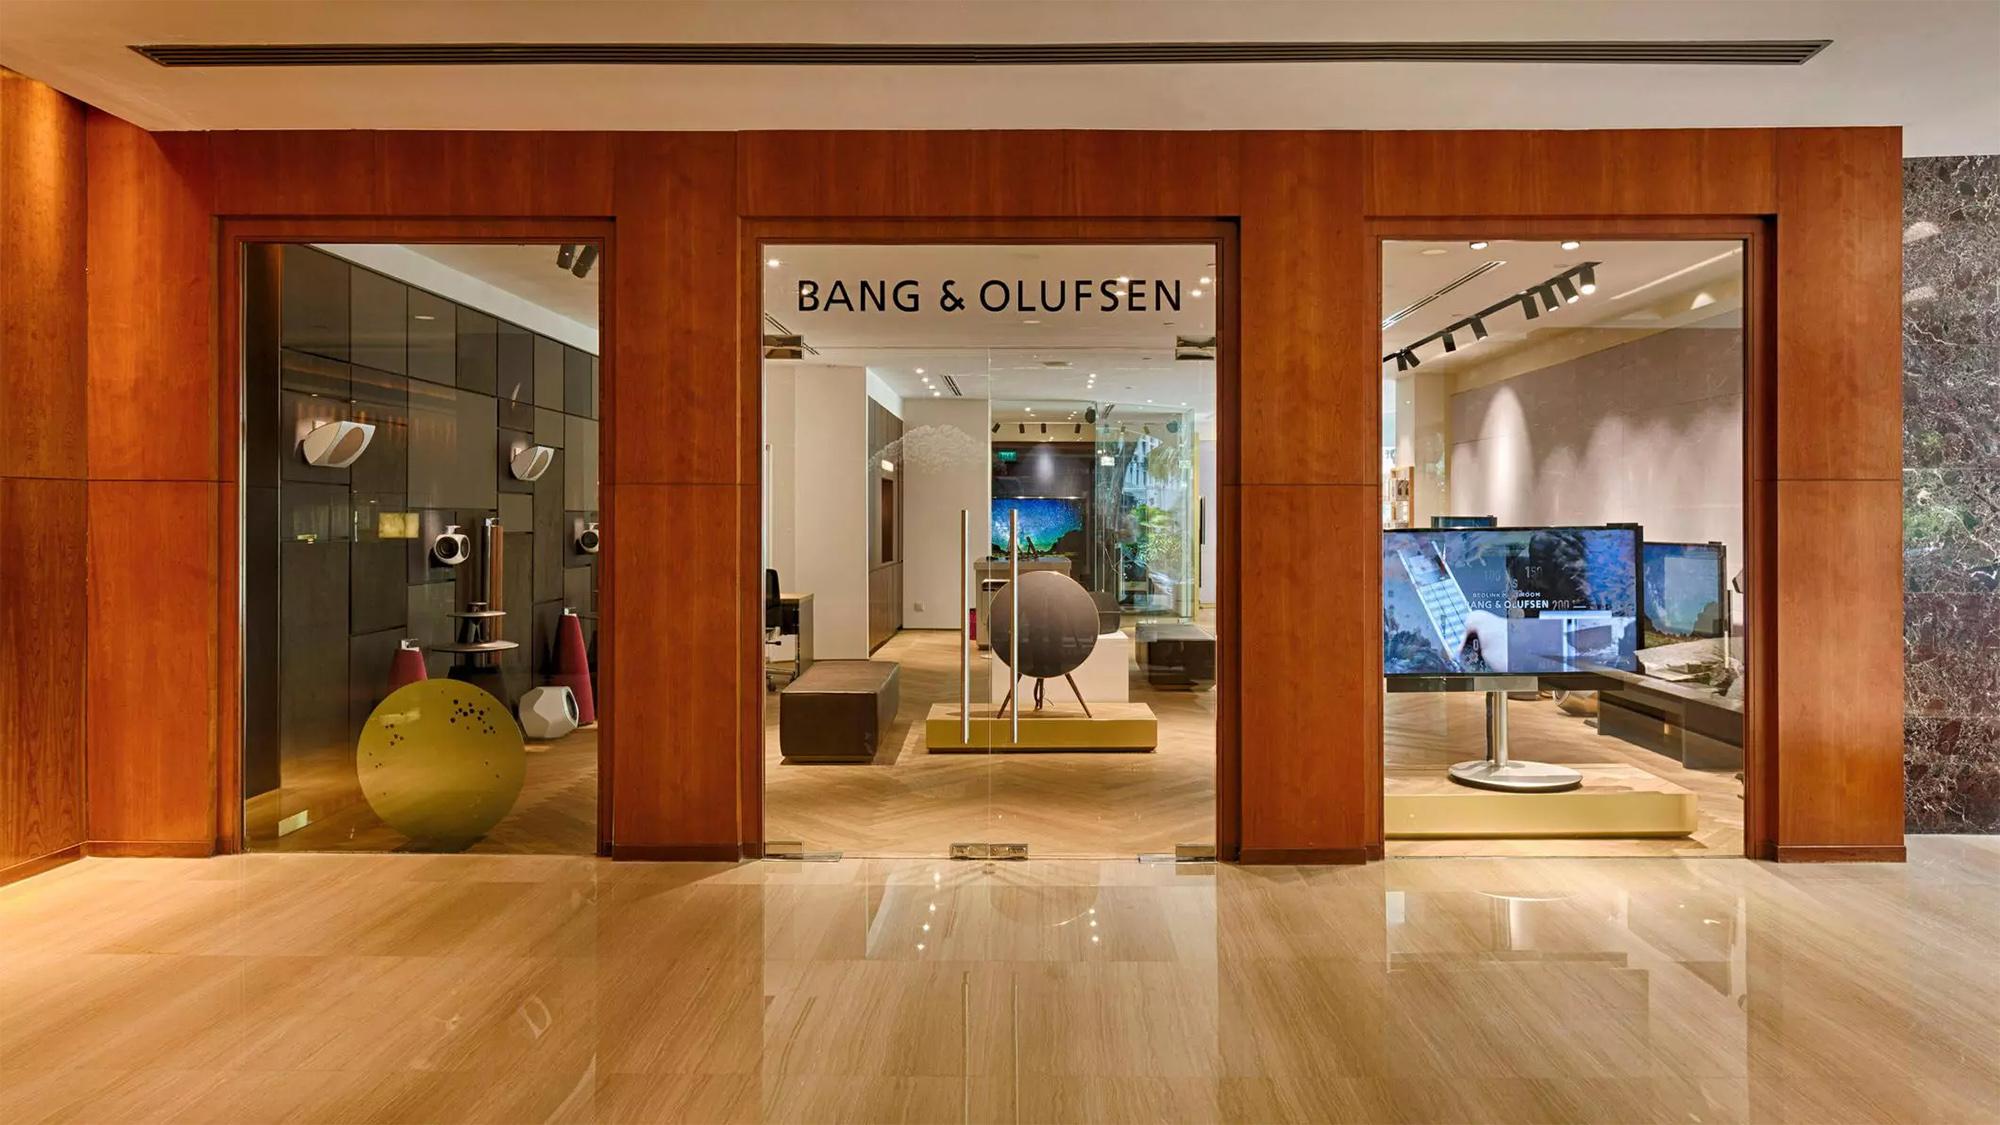 B&O Store Singapore (Bang & Olufsen).jpg